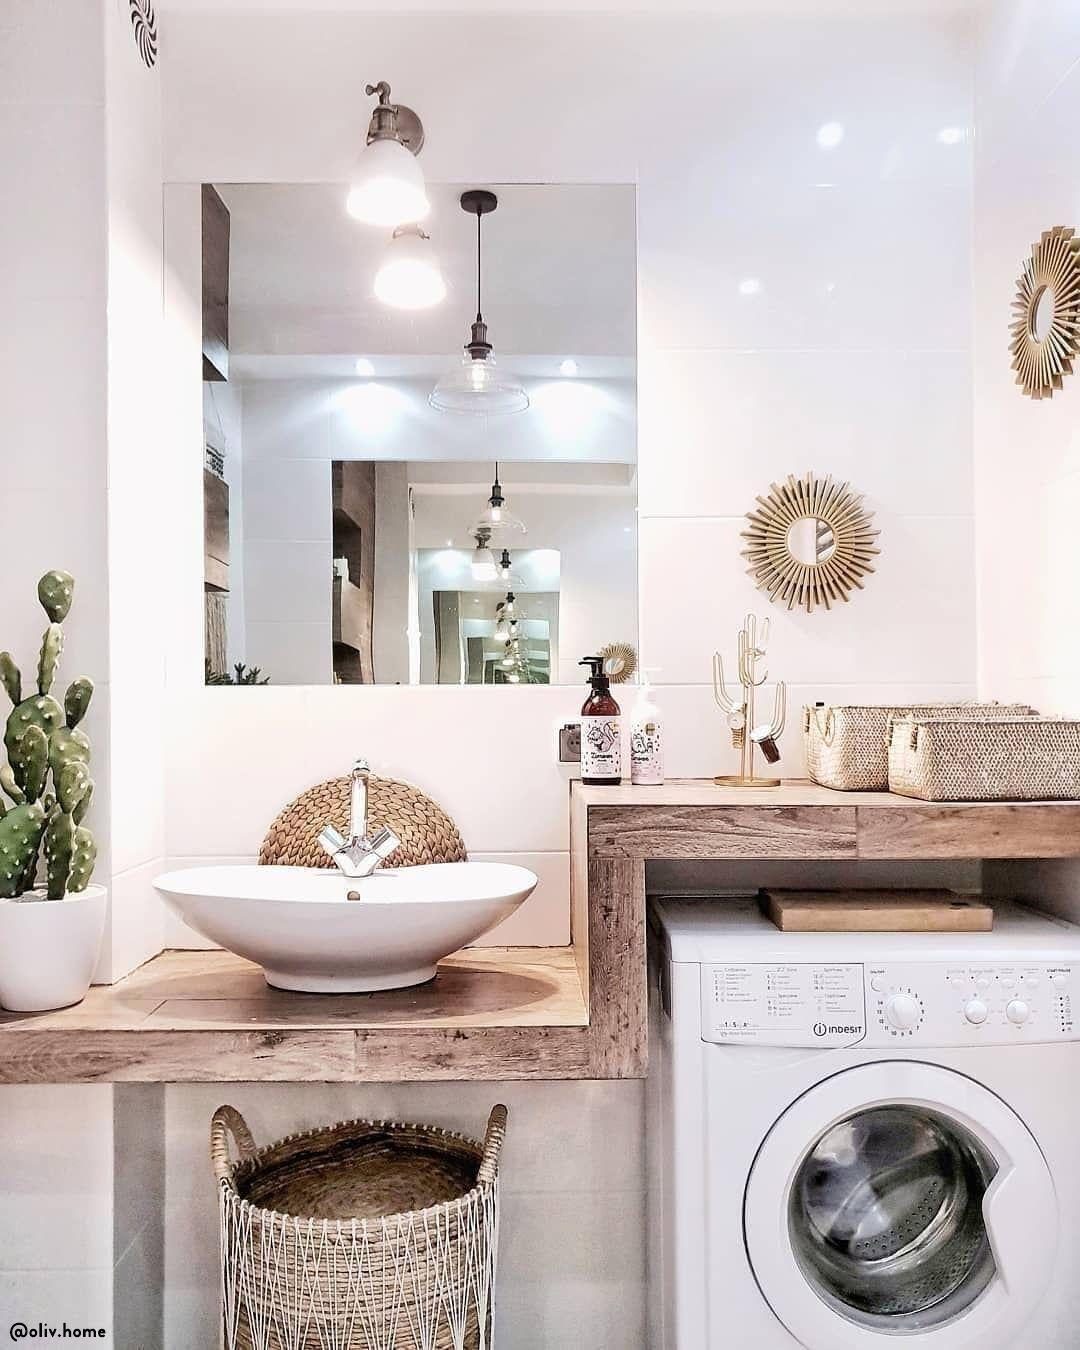 25 Stunning Shabby Chic Bathroom Designs That Will Adore You - 4A4A9816Cd64975596Ba80Cddefc0Bff